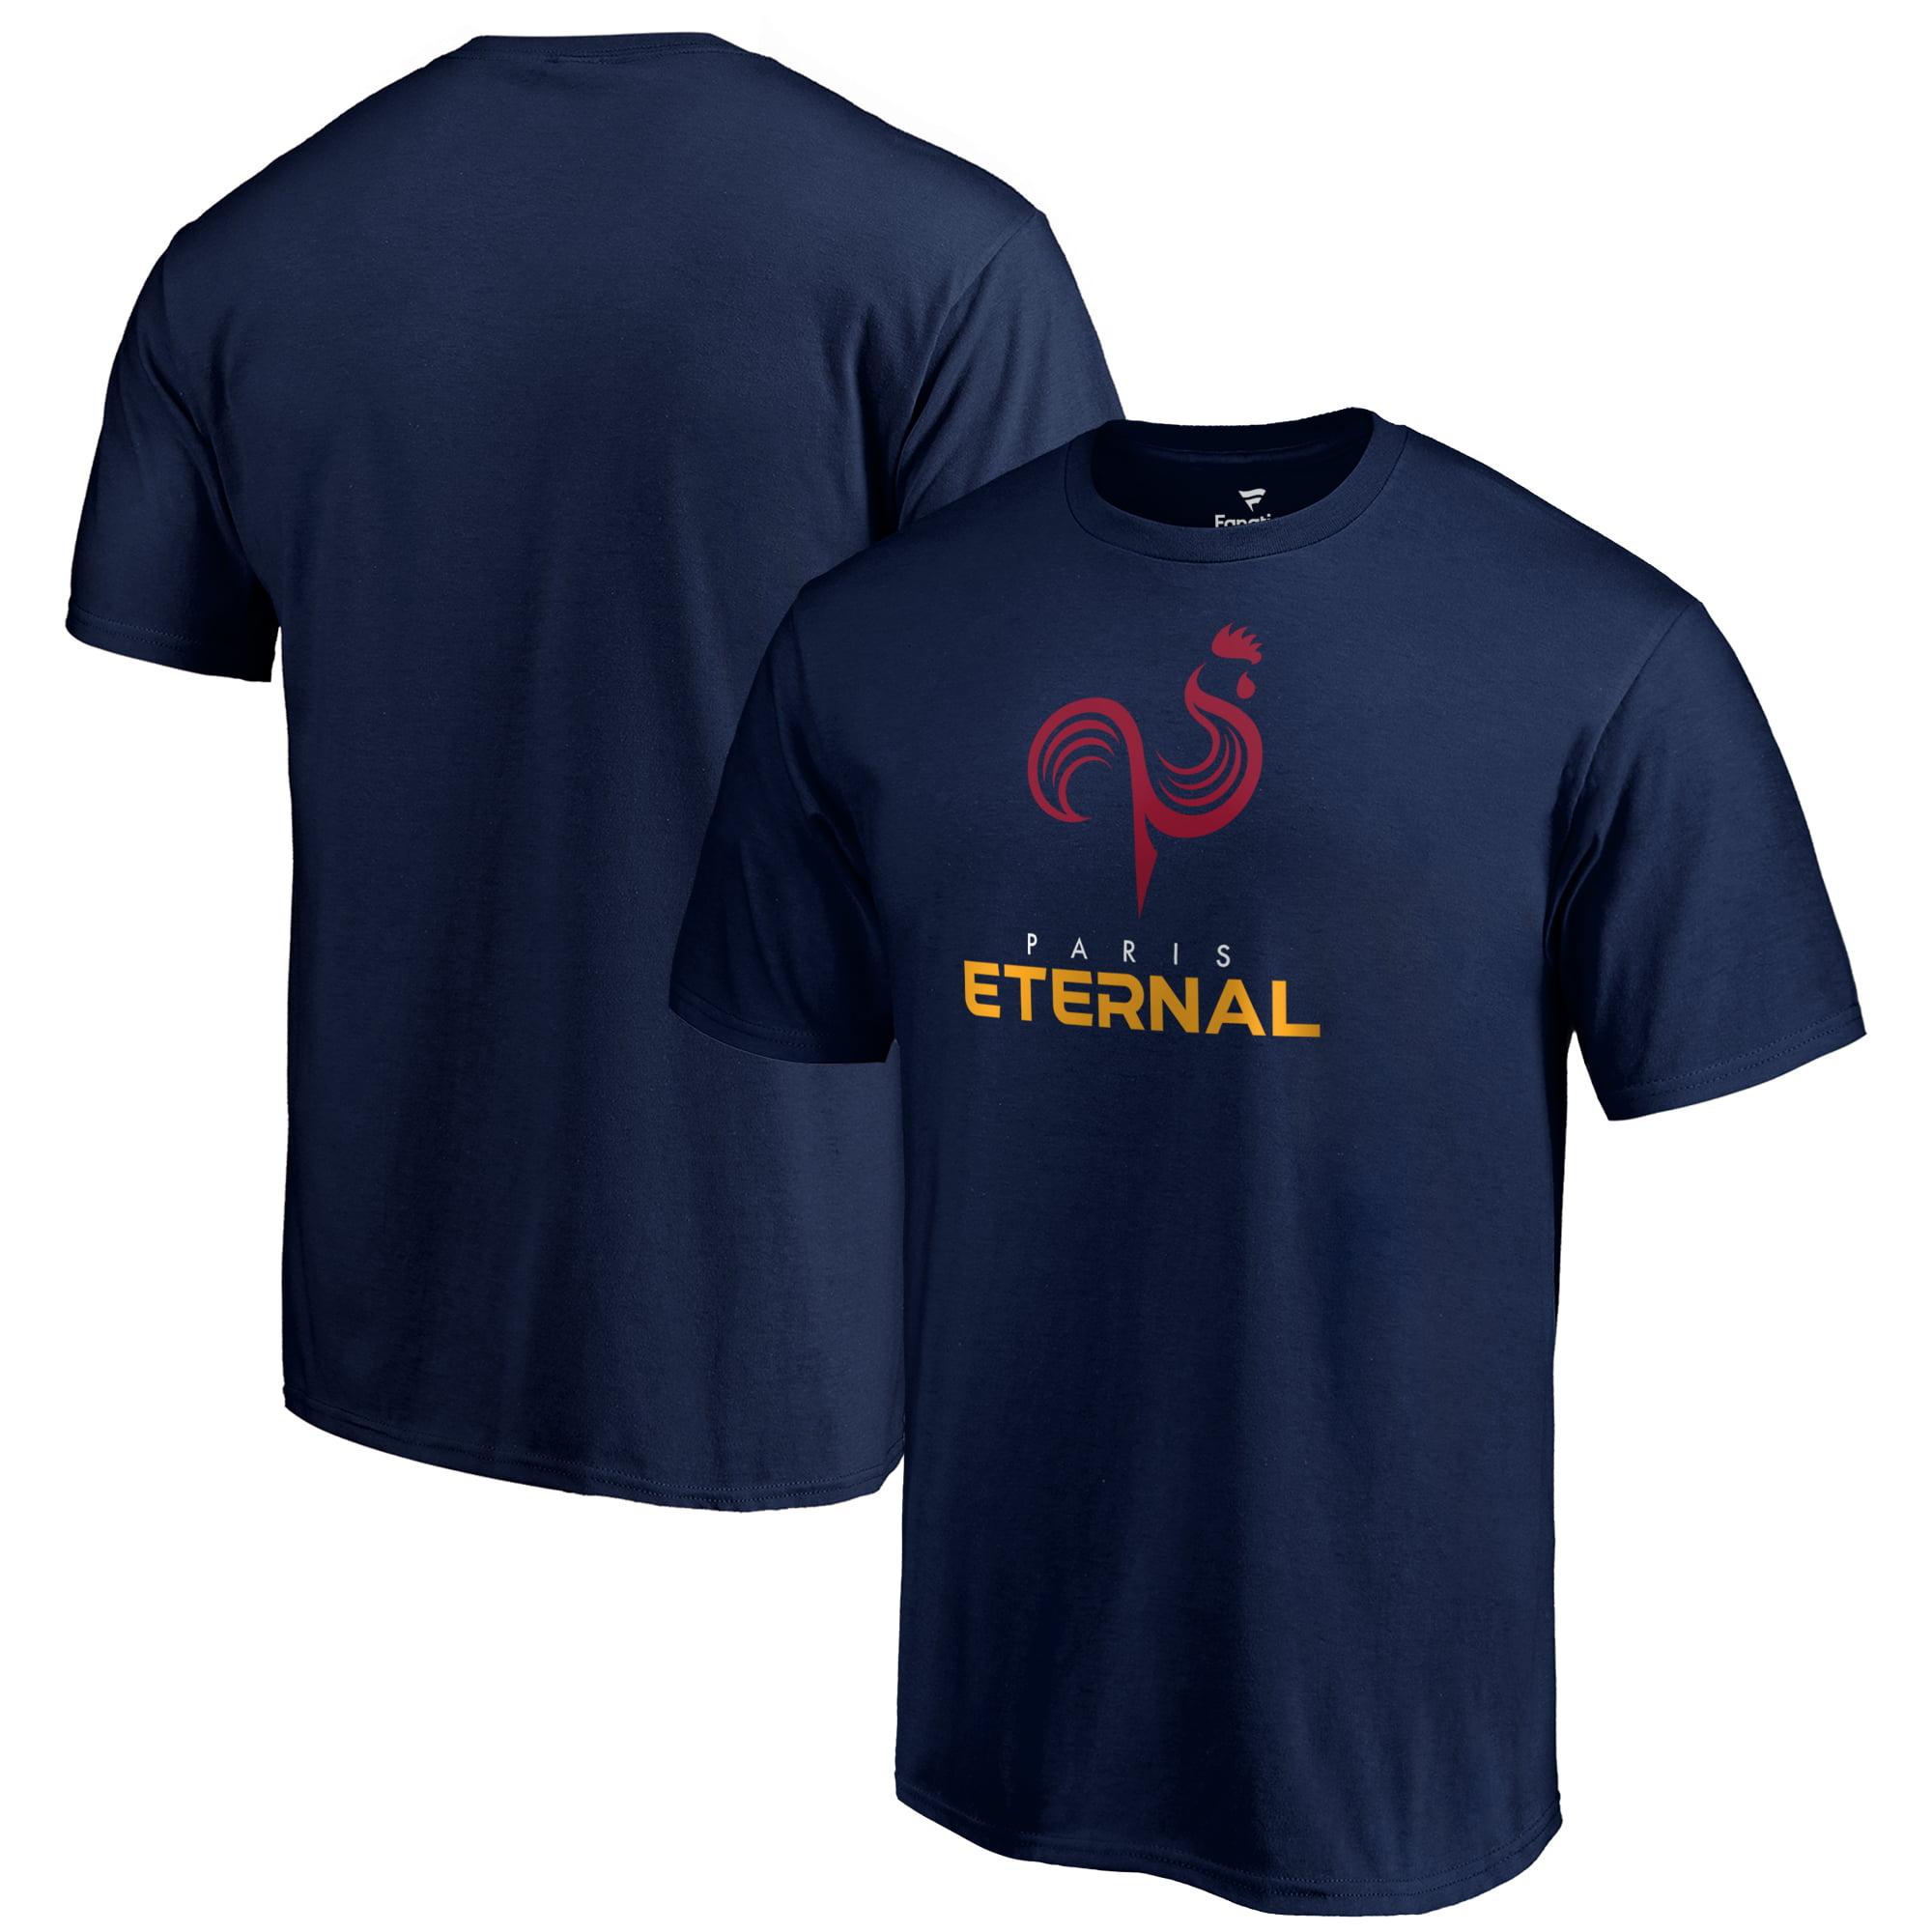 Paris Eternal Fanatics Branded Team Identity T-Shirt - Navy